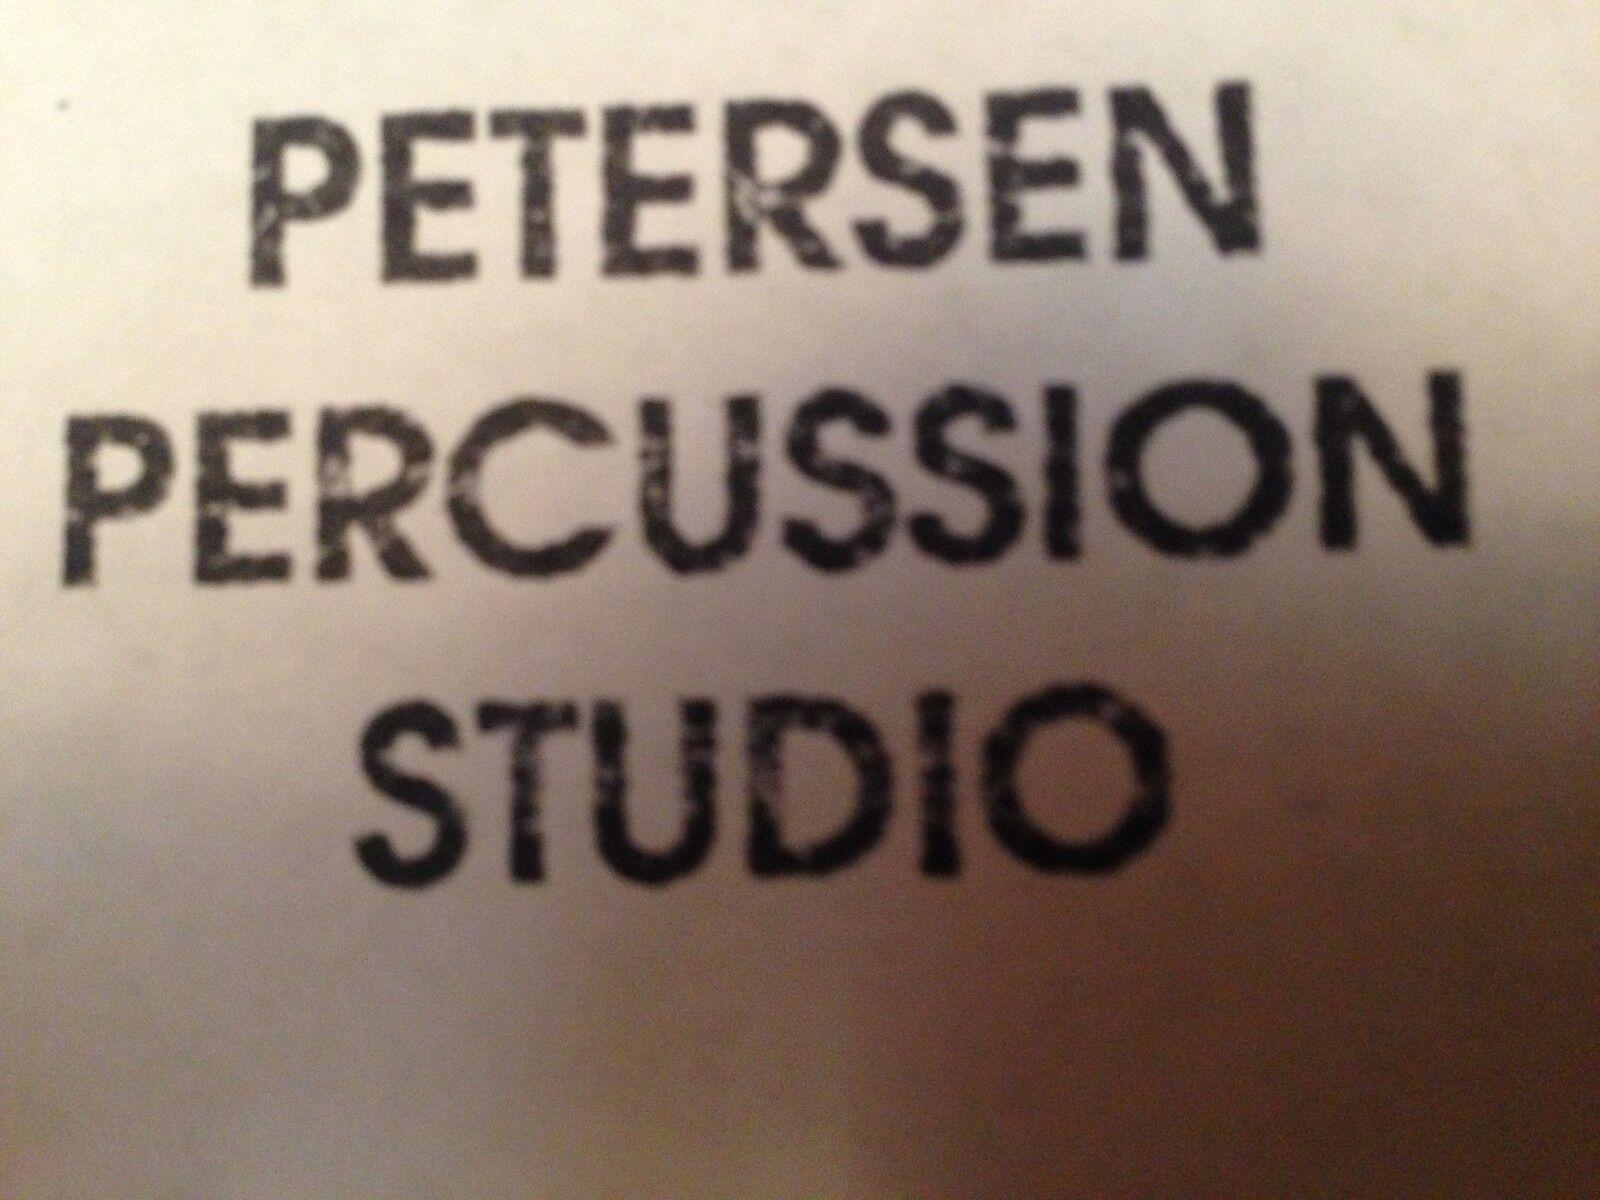 petersenpercussionstudio